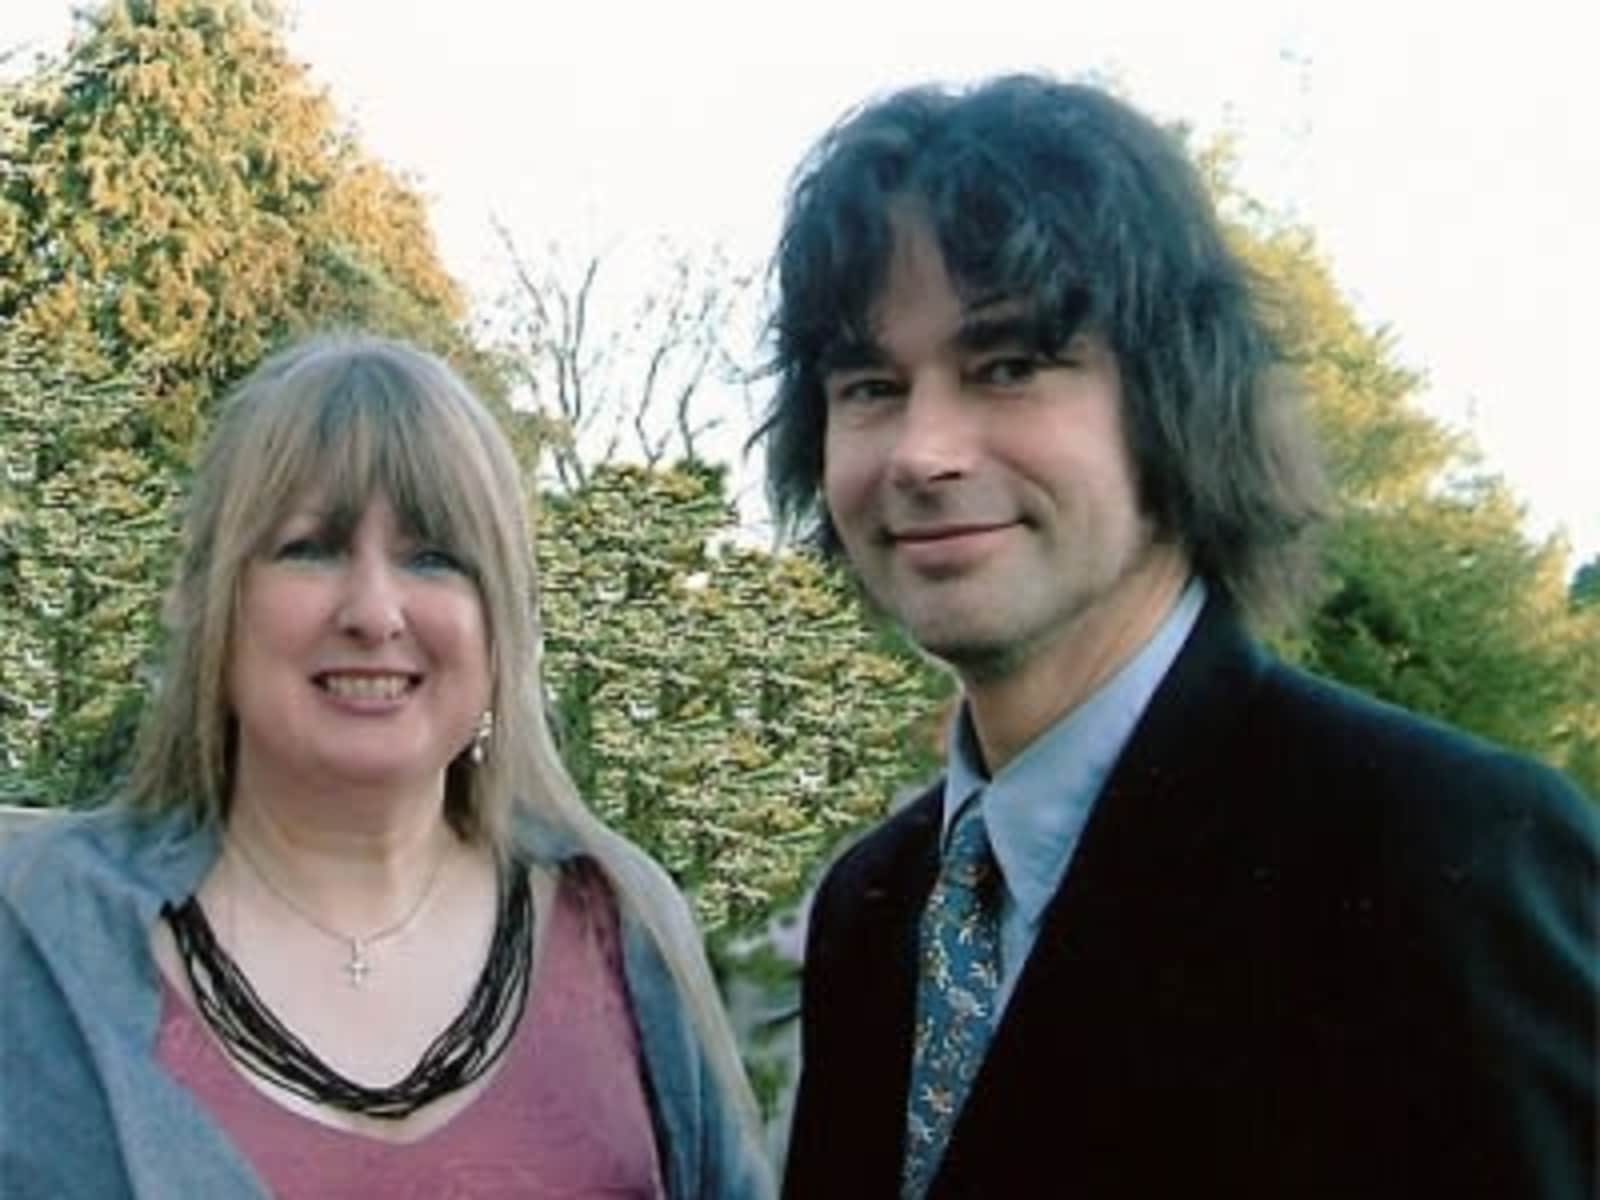 Mia & Leo from Maidstone, United Kingdom